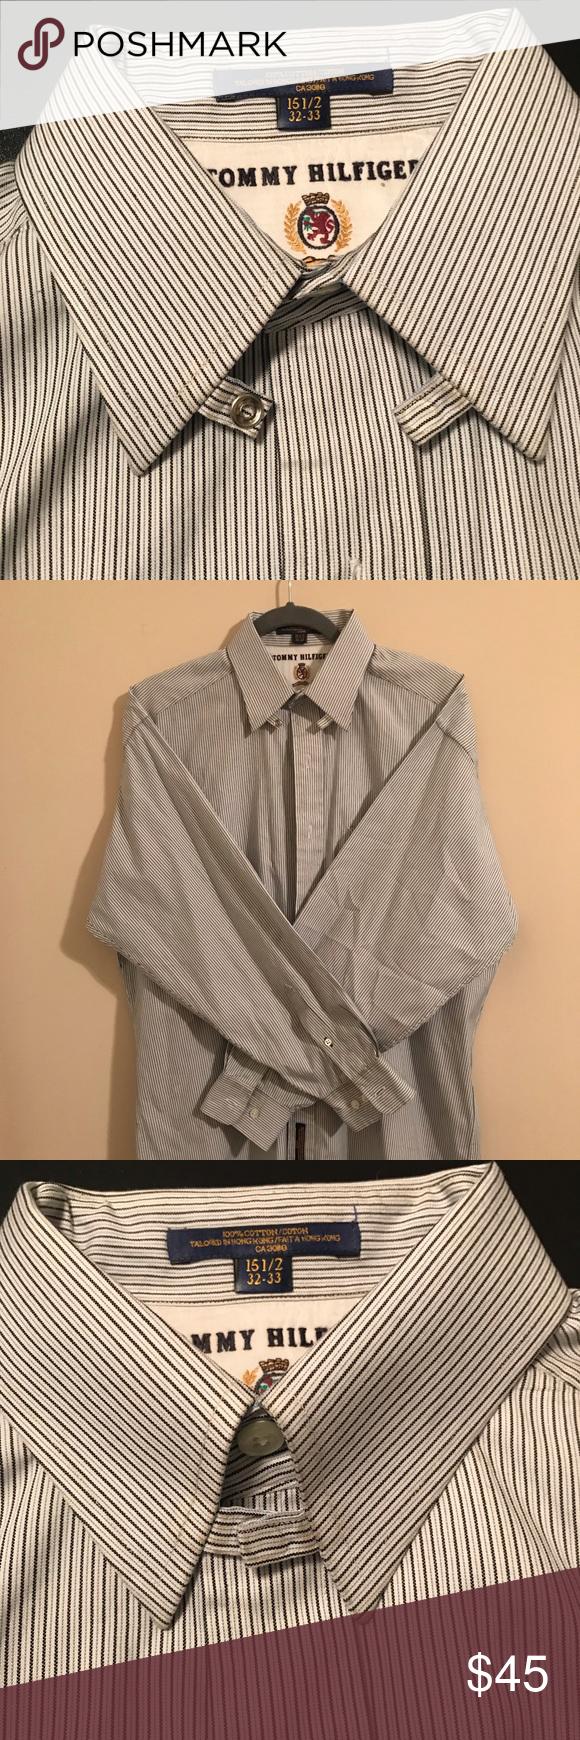 f396ae33 Tommy Hilfiger White Tab Collar Dress Shirt - DREAMWORKS